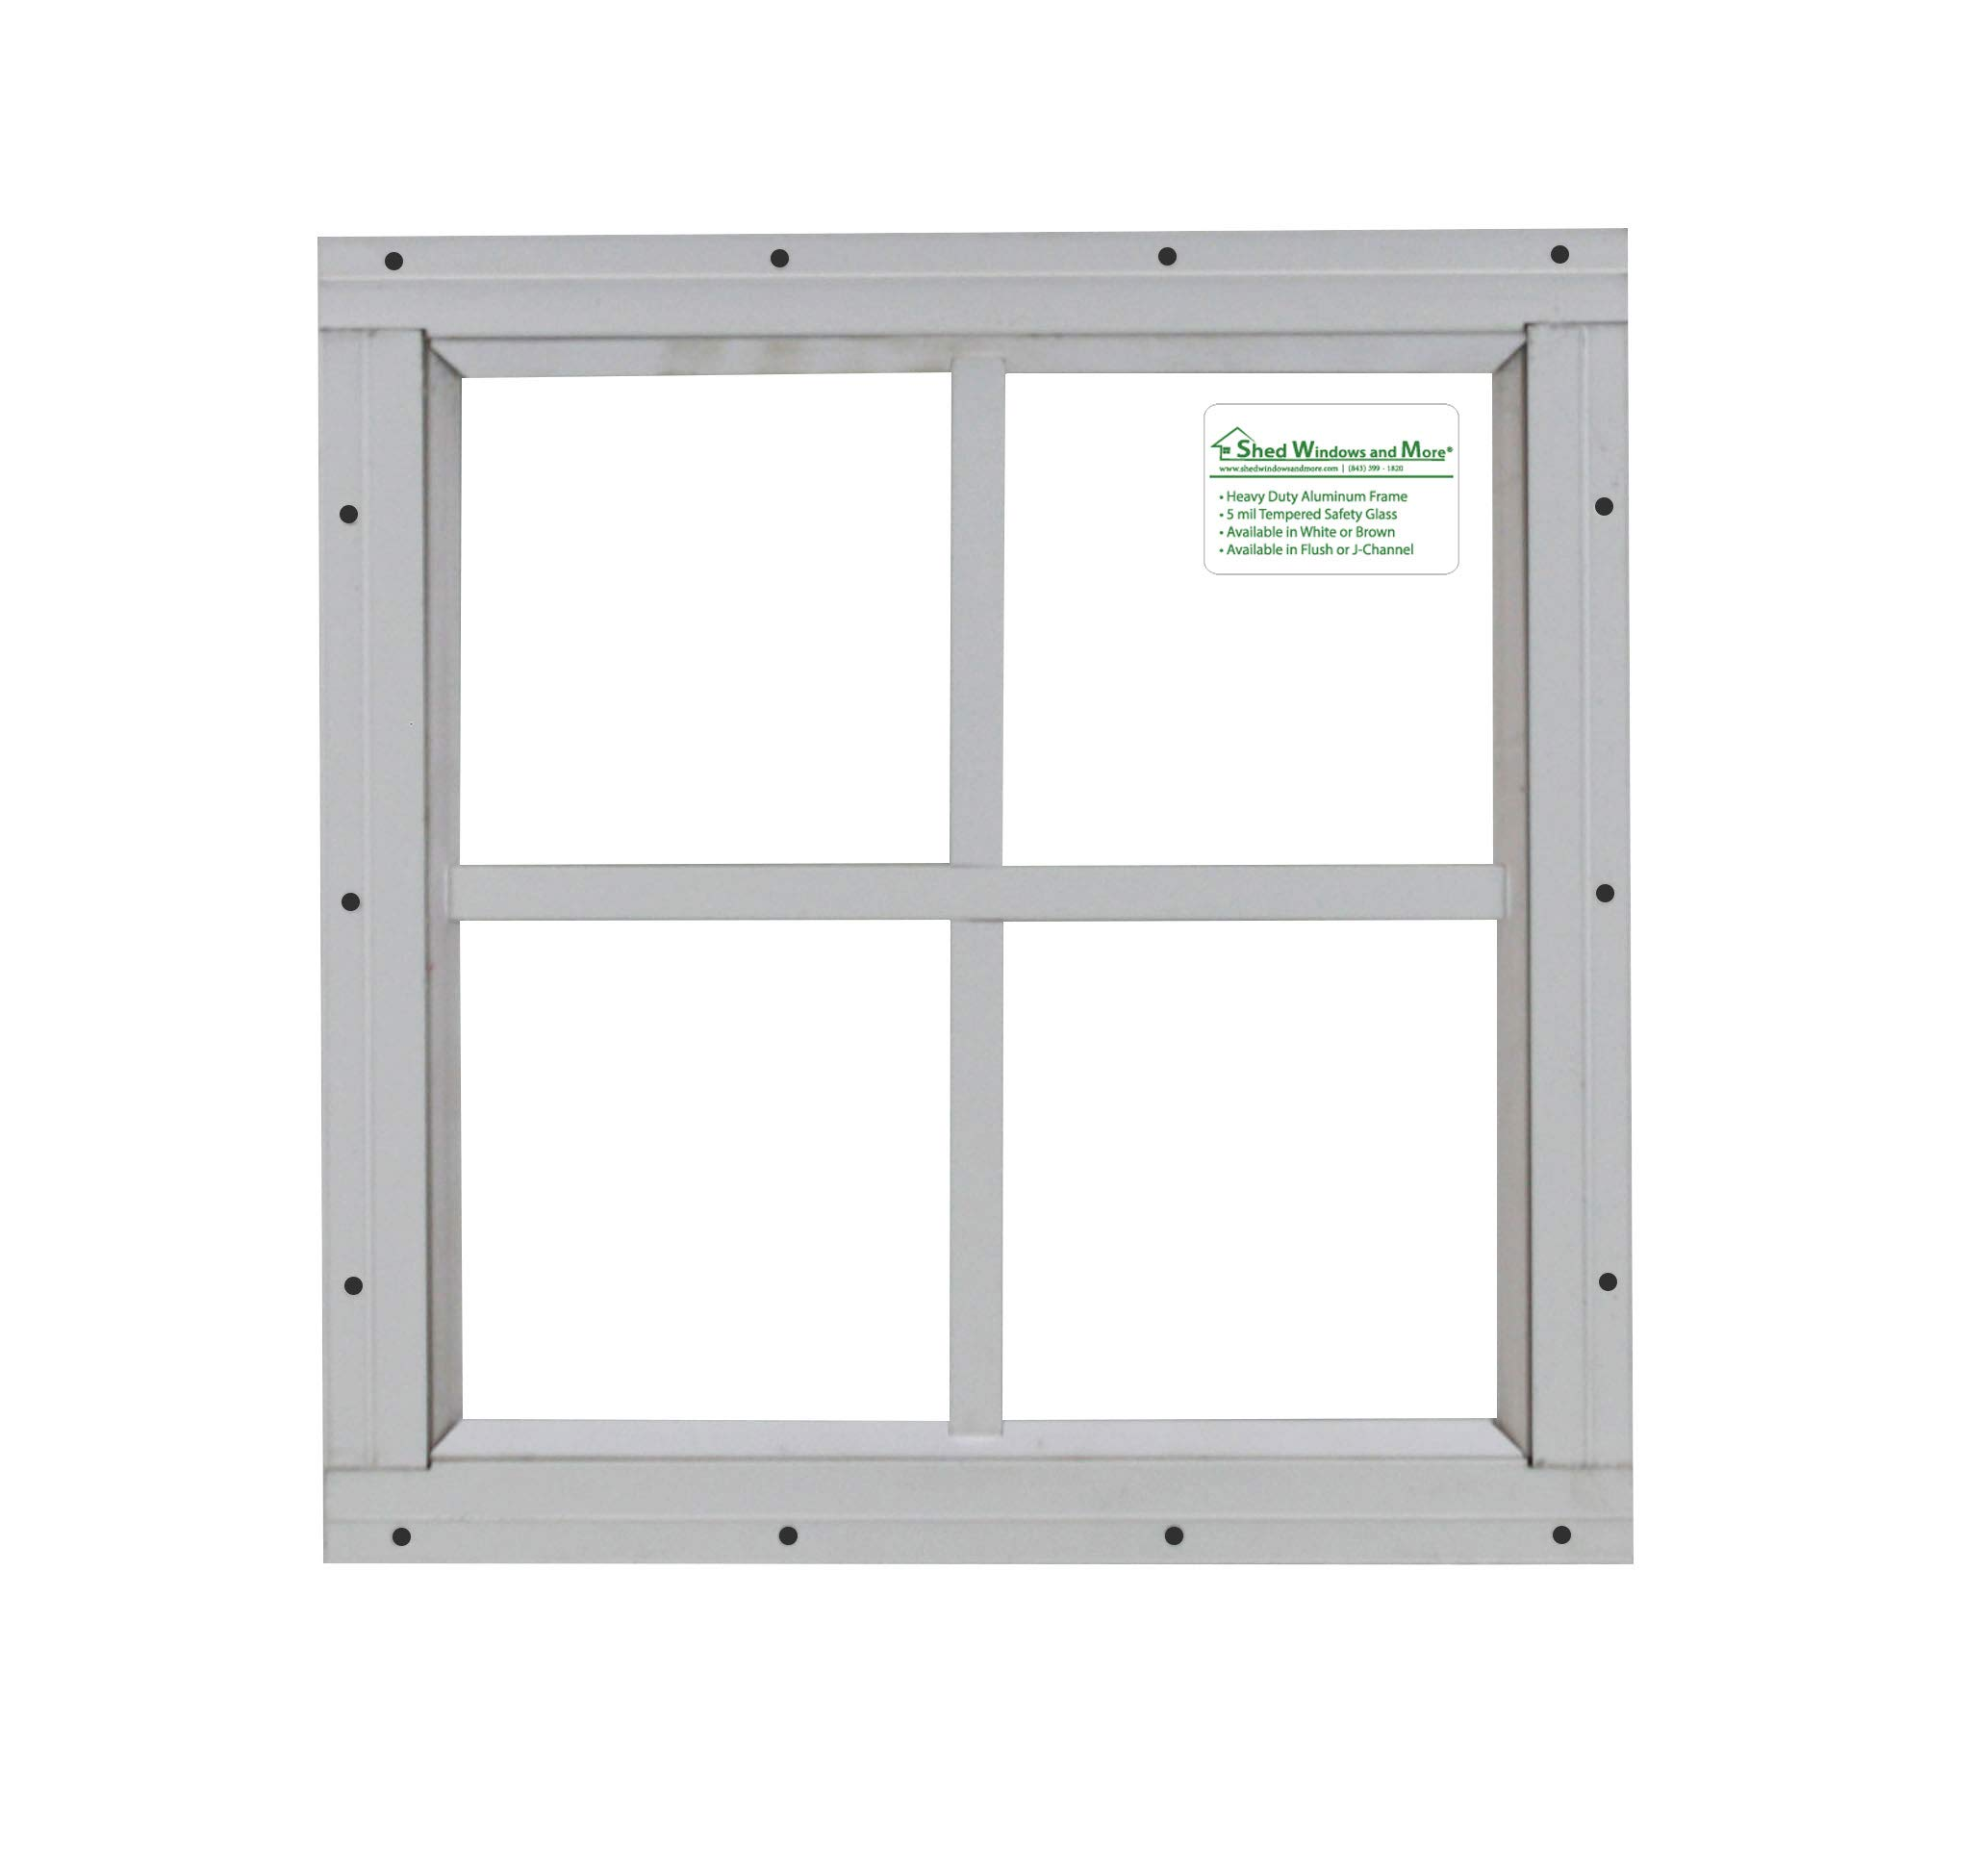 Shed Windows 12'' x 12'' White Flush Mount Safety Glass